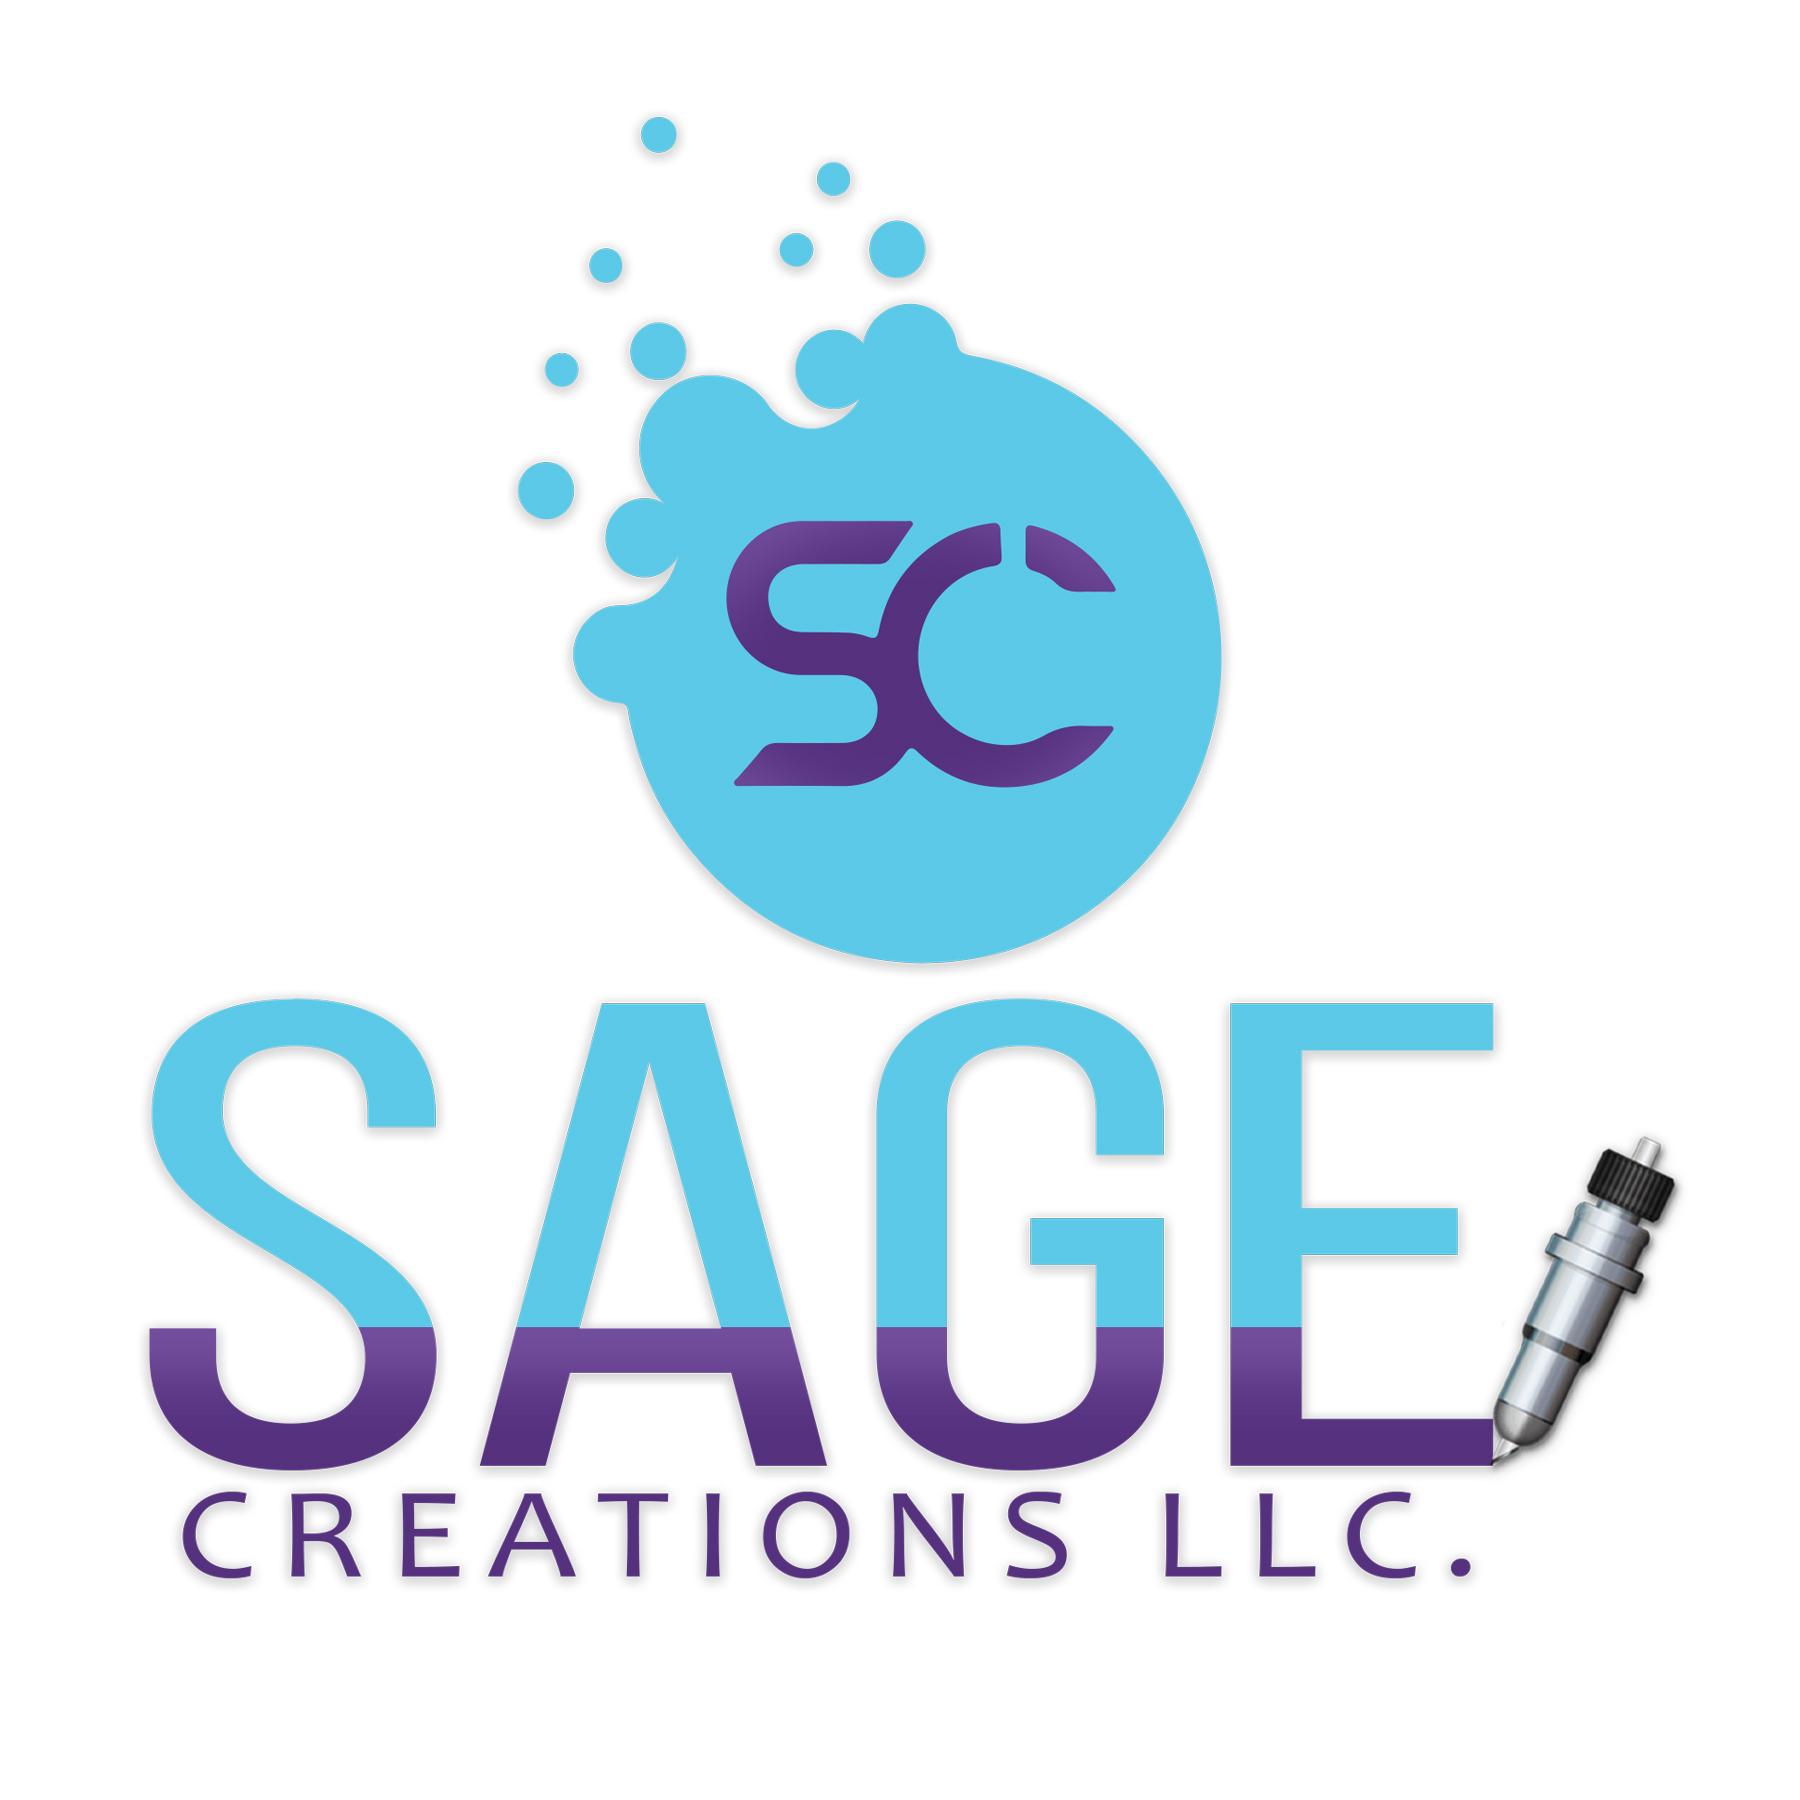 SAGE CREATIONS